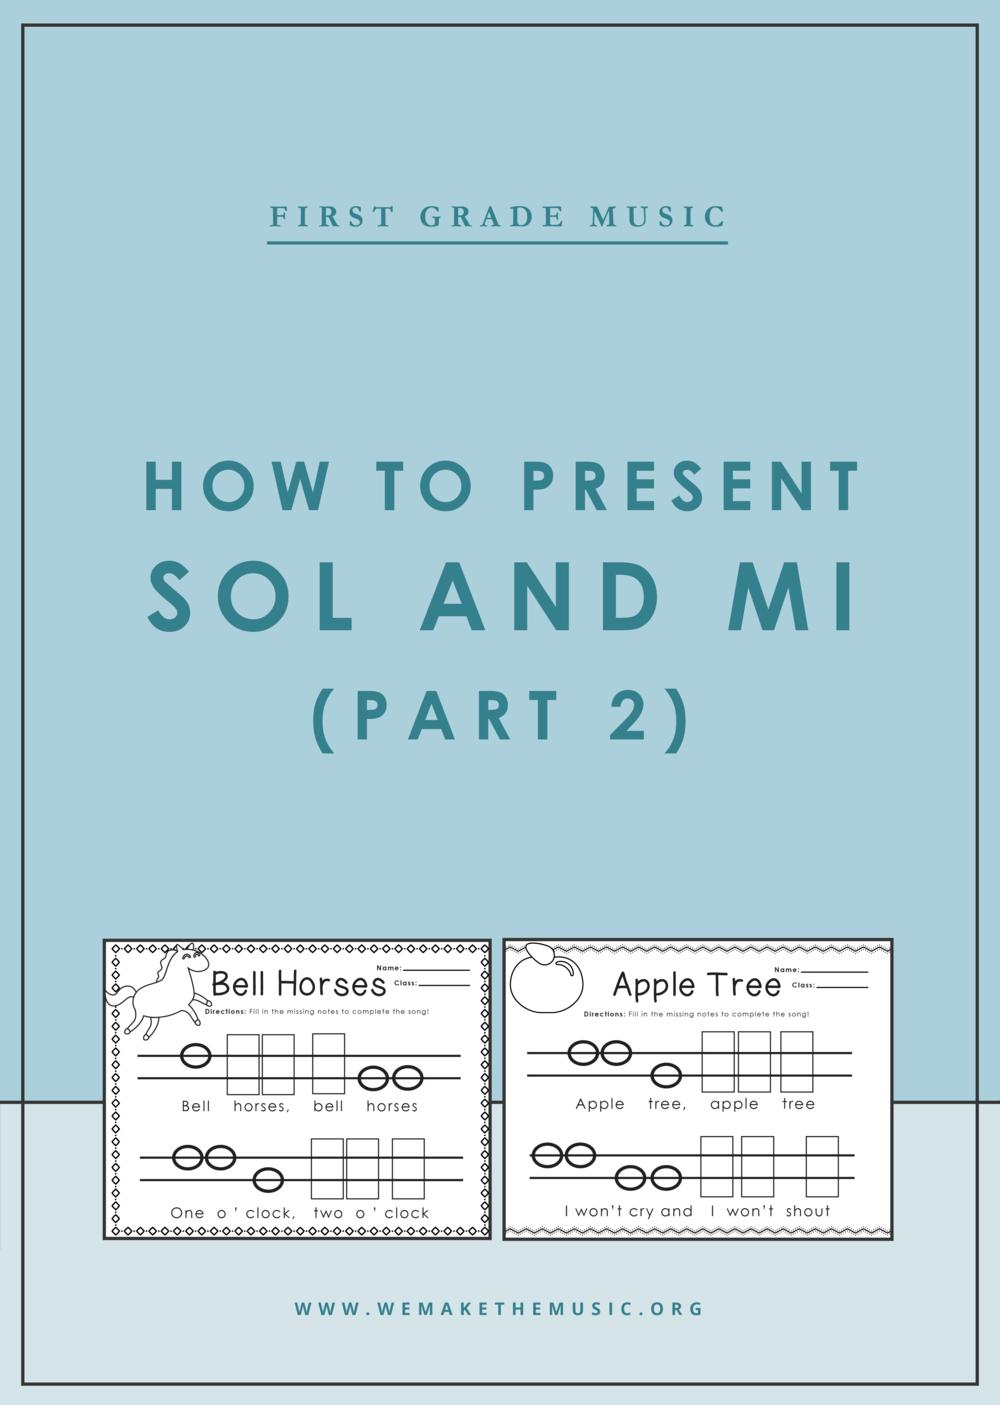 WAMM Presenting Sol and Mi_12-19 Sol Mi Present.png